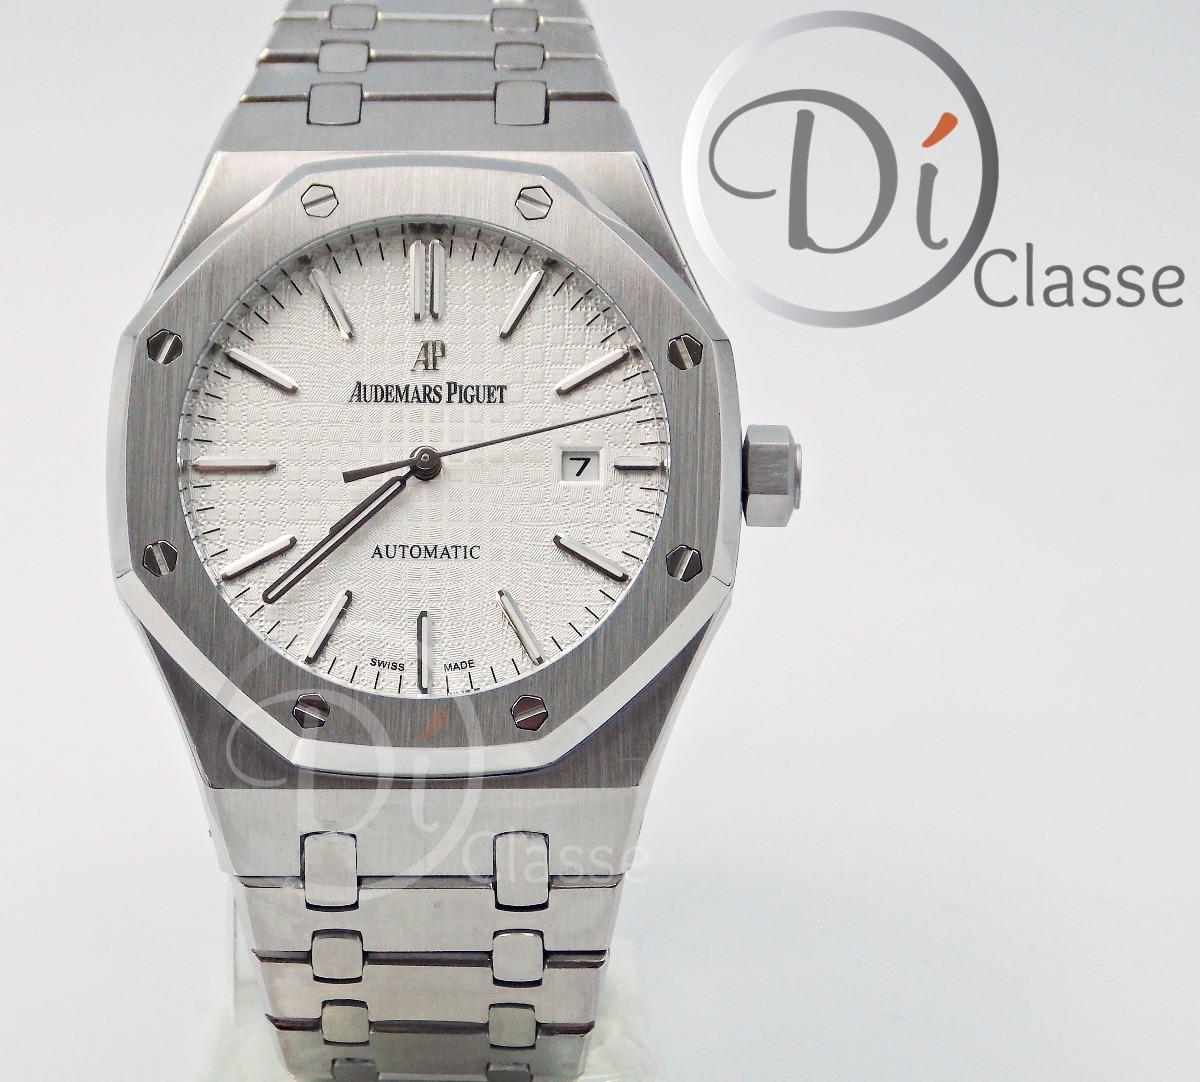 1d39253f983 Reloj Audemars Piguet Royal Oak Acero En Blanco -   4